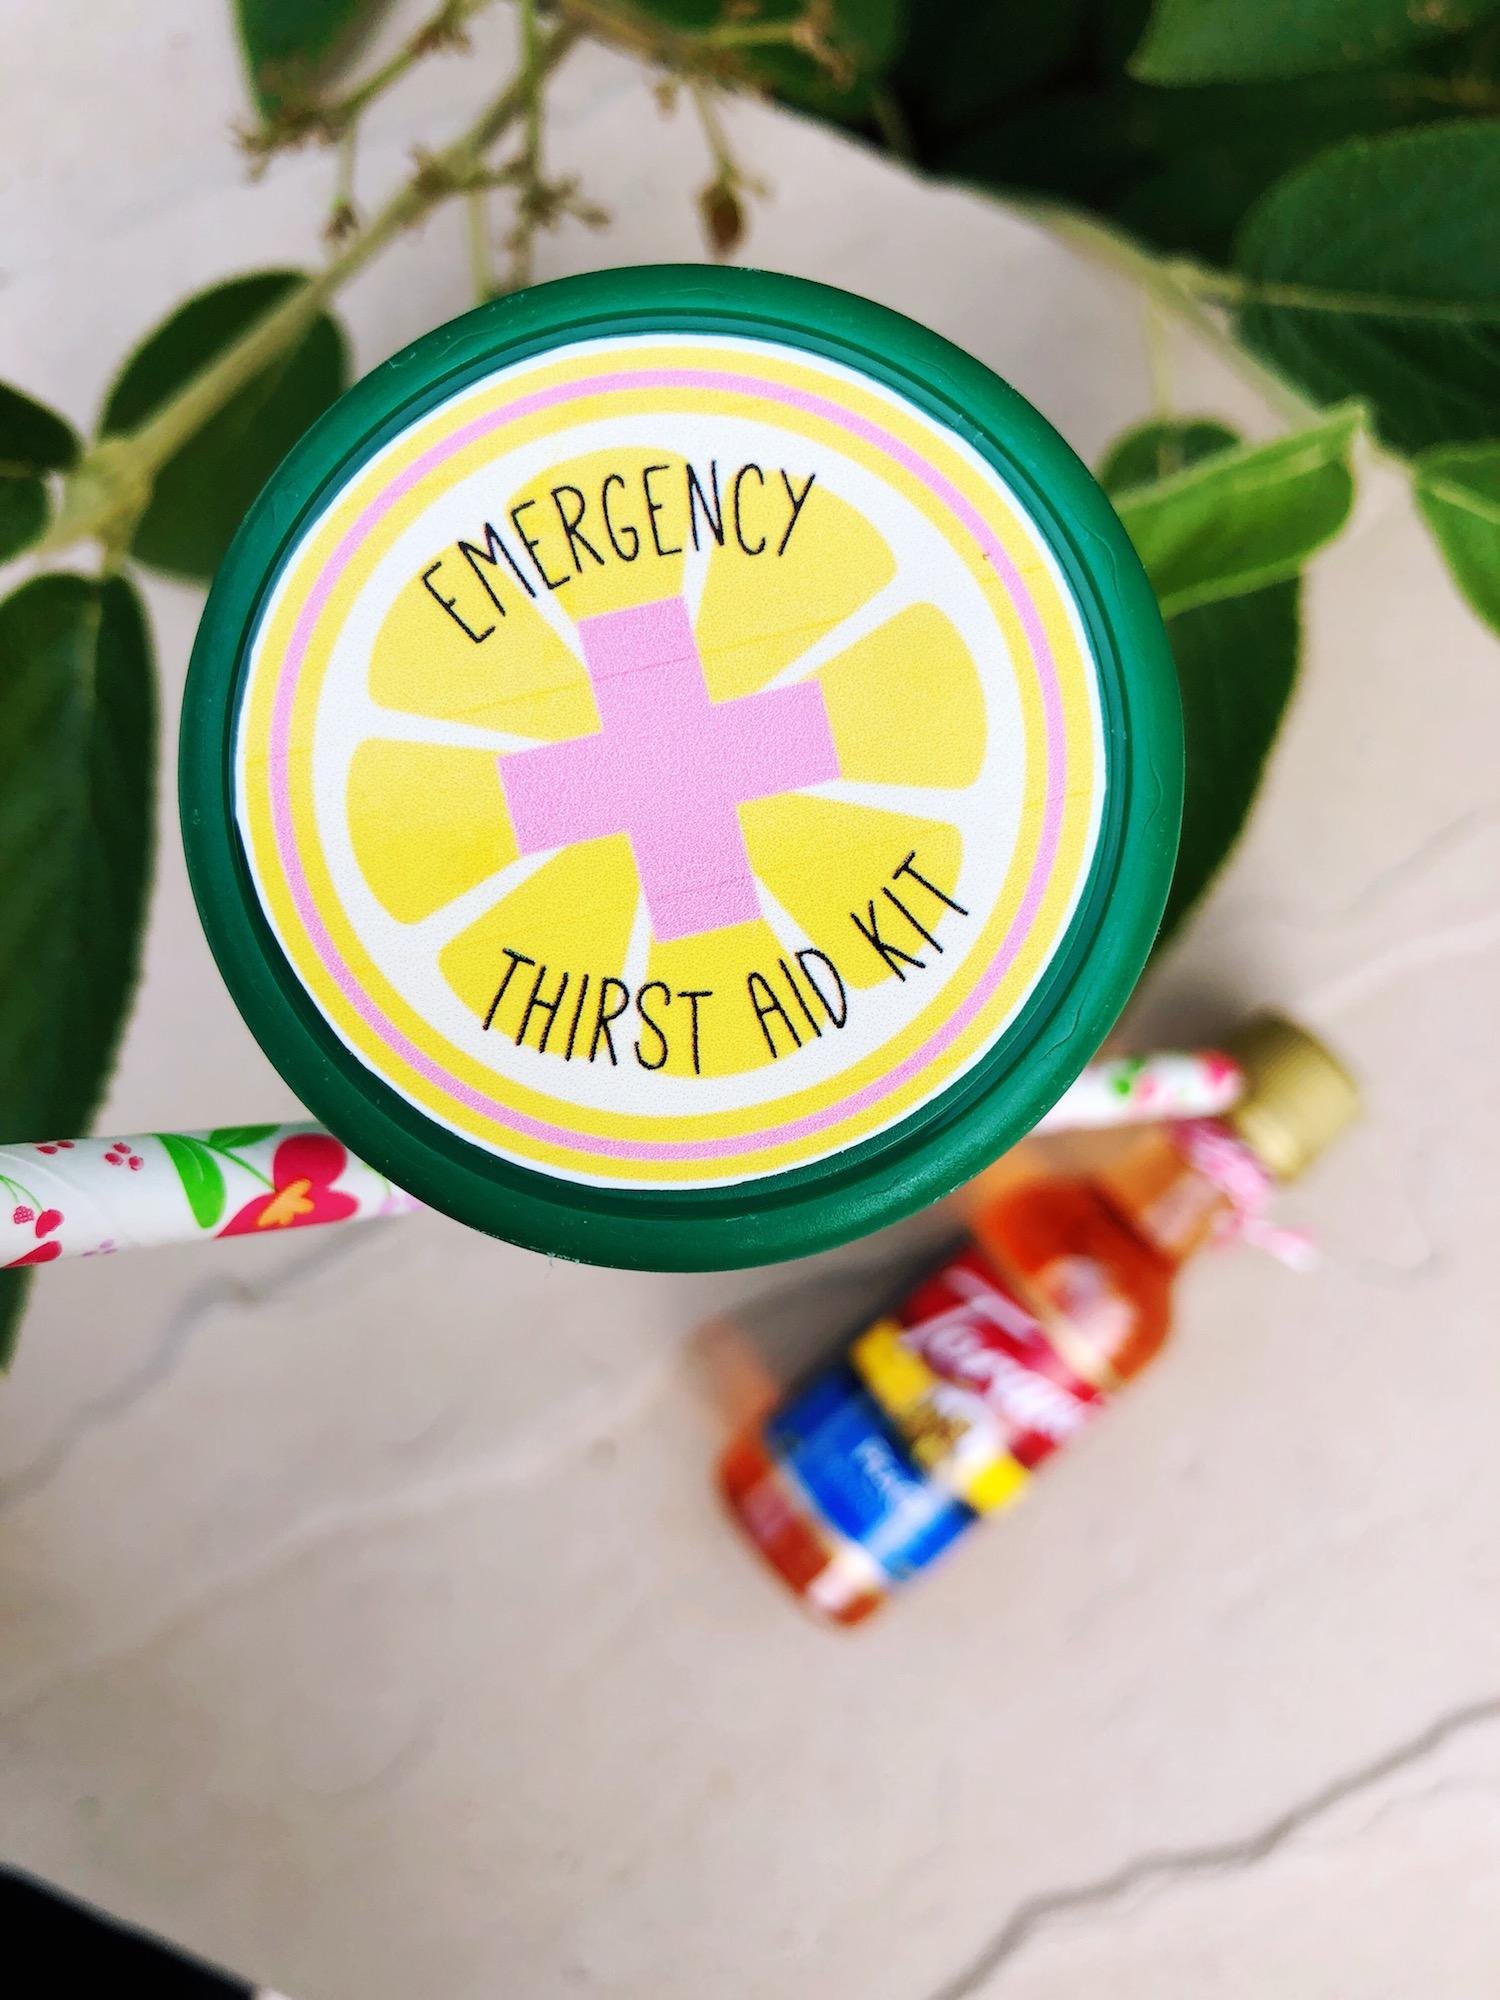 Emergency Thirst Aid Kit_Lemonade Printable_Drink Party Favor Summer_Design Organize Party.JPG